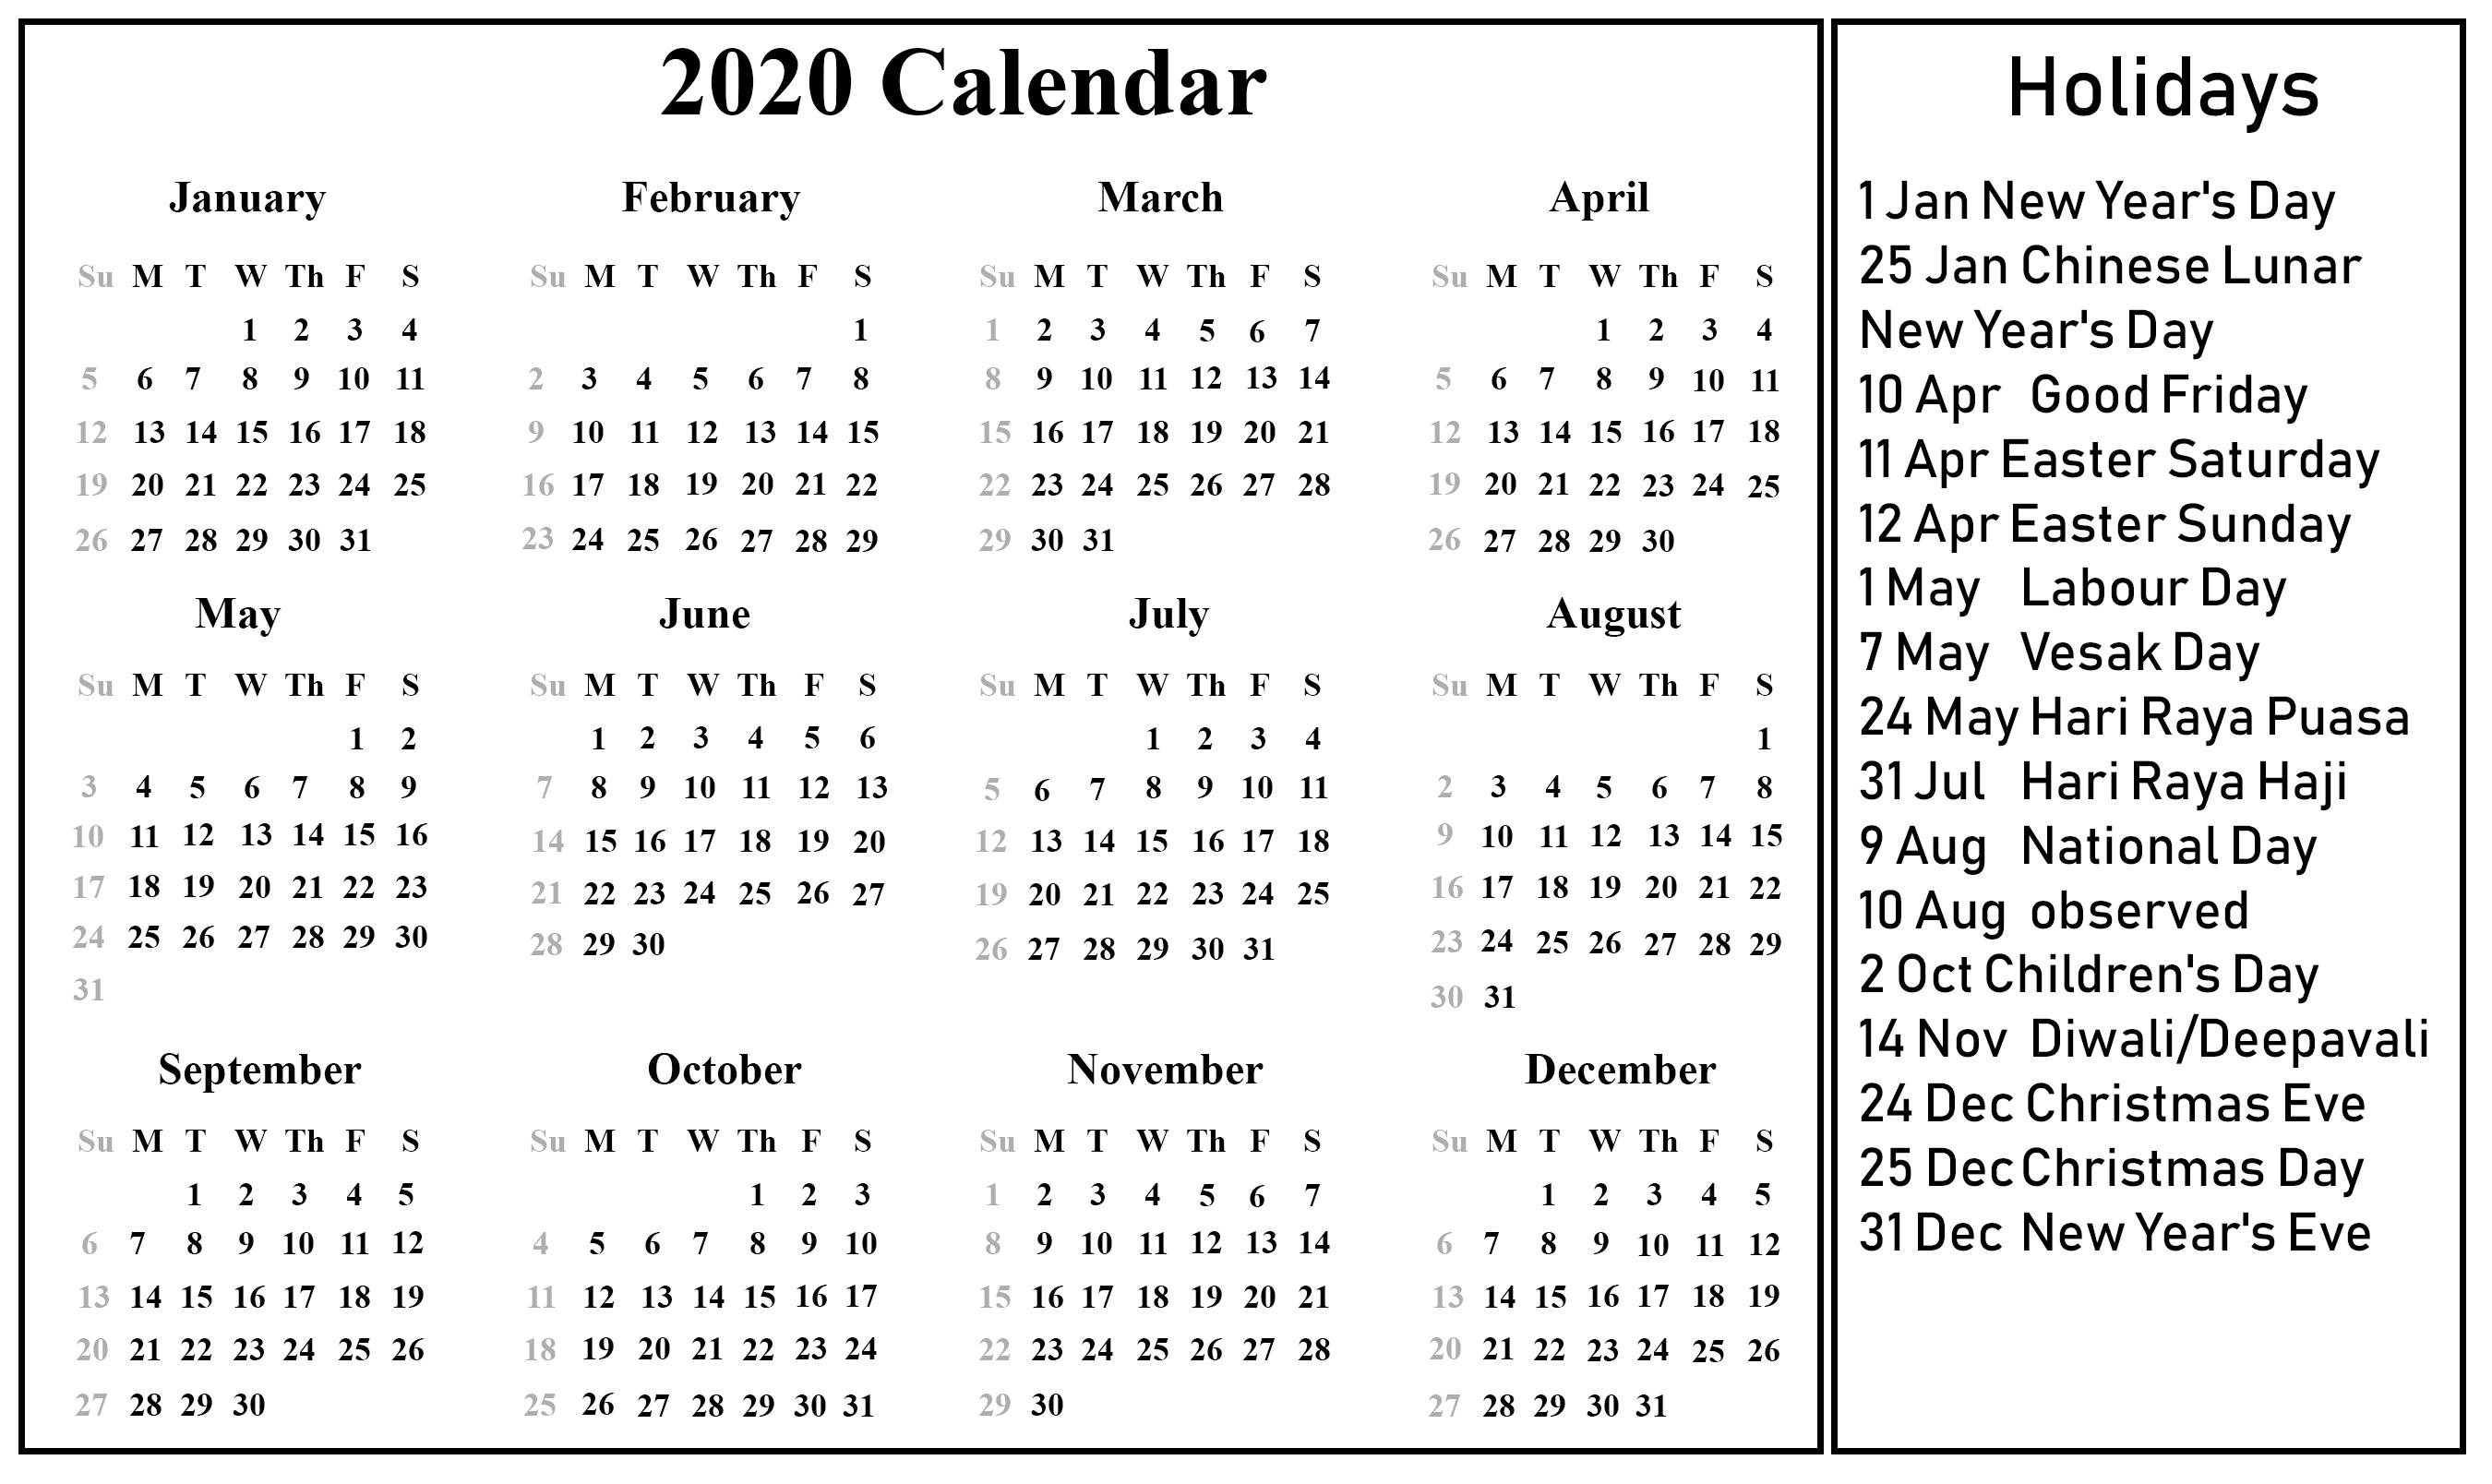 Printable Christmas Calendar 2020 Singapore 2020 Printable Holidays Calendar | Holiday calendar